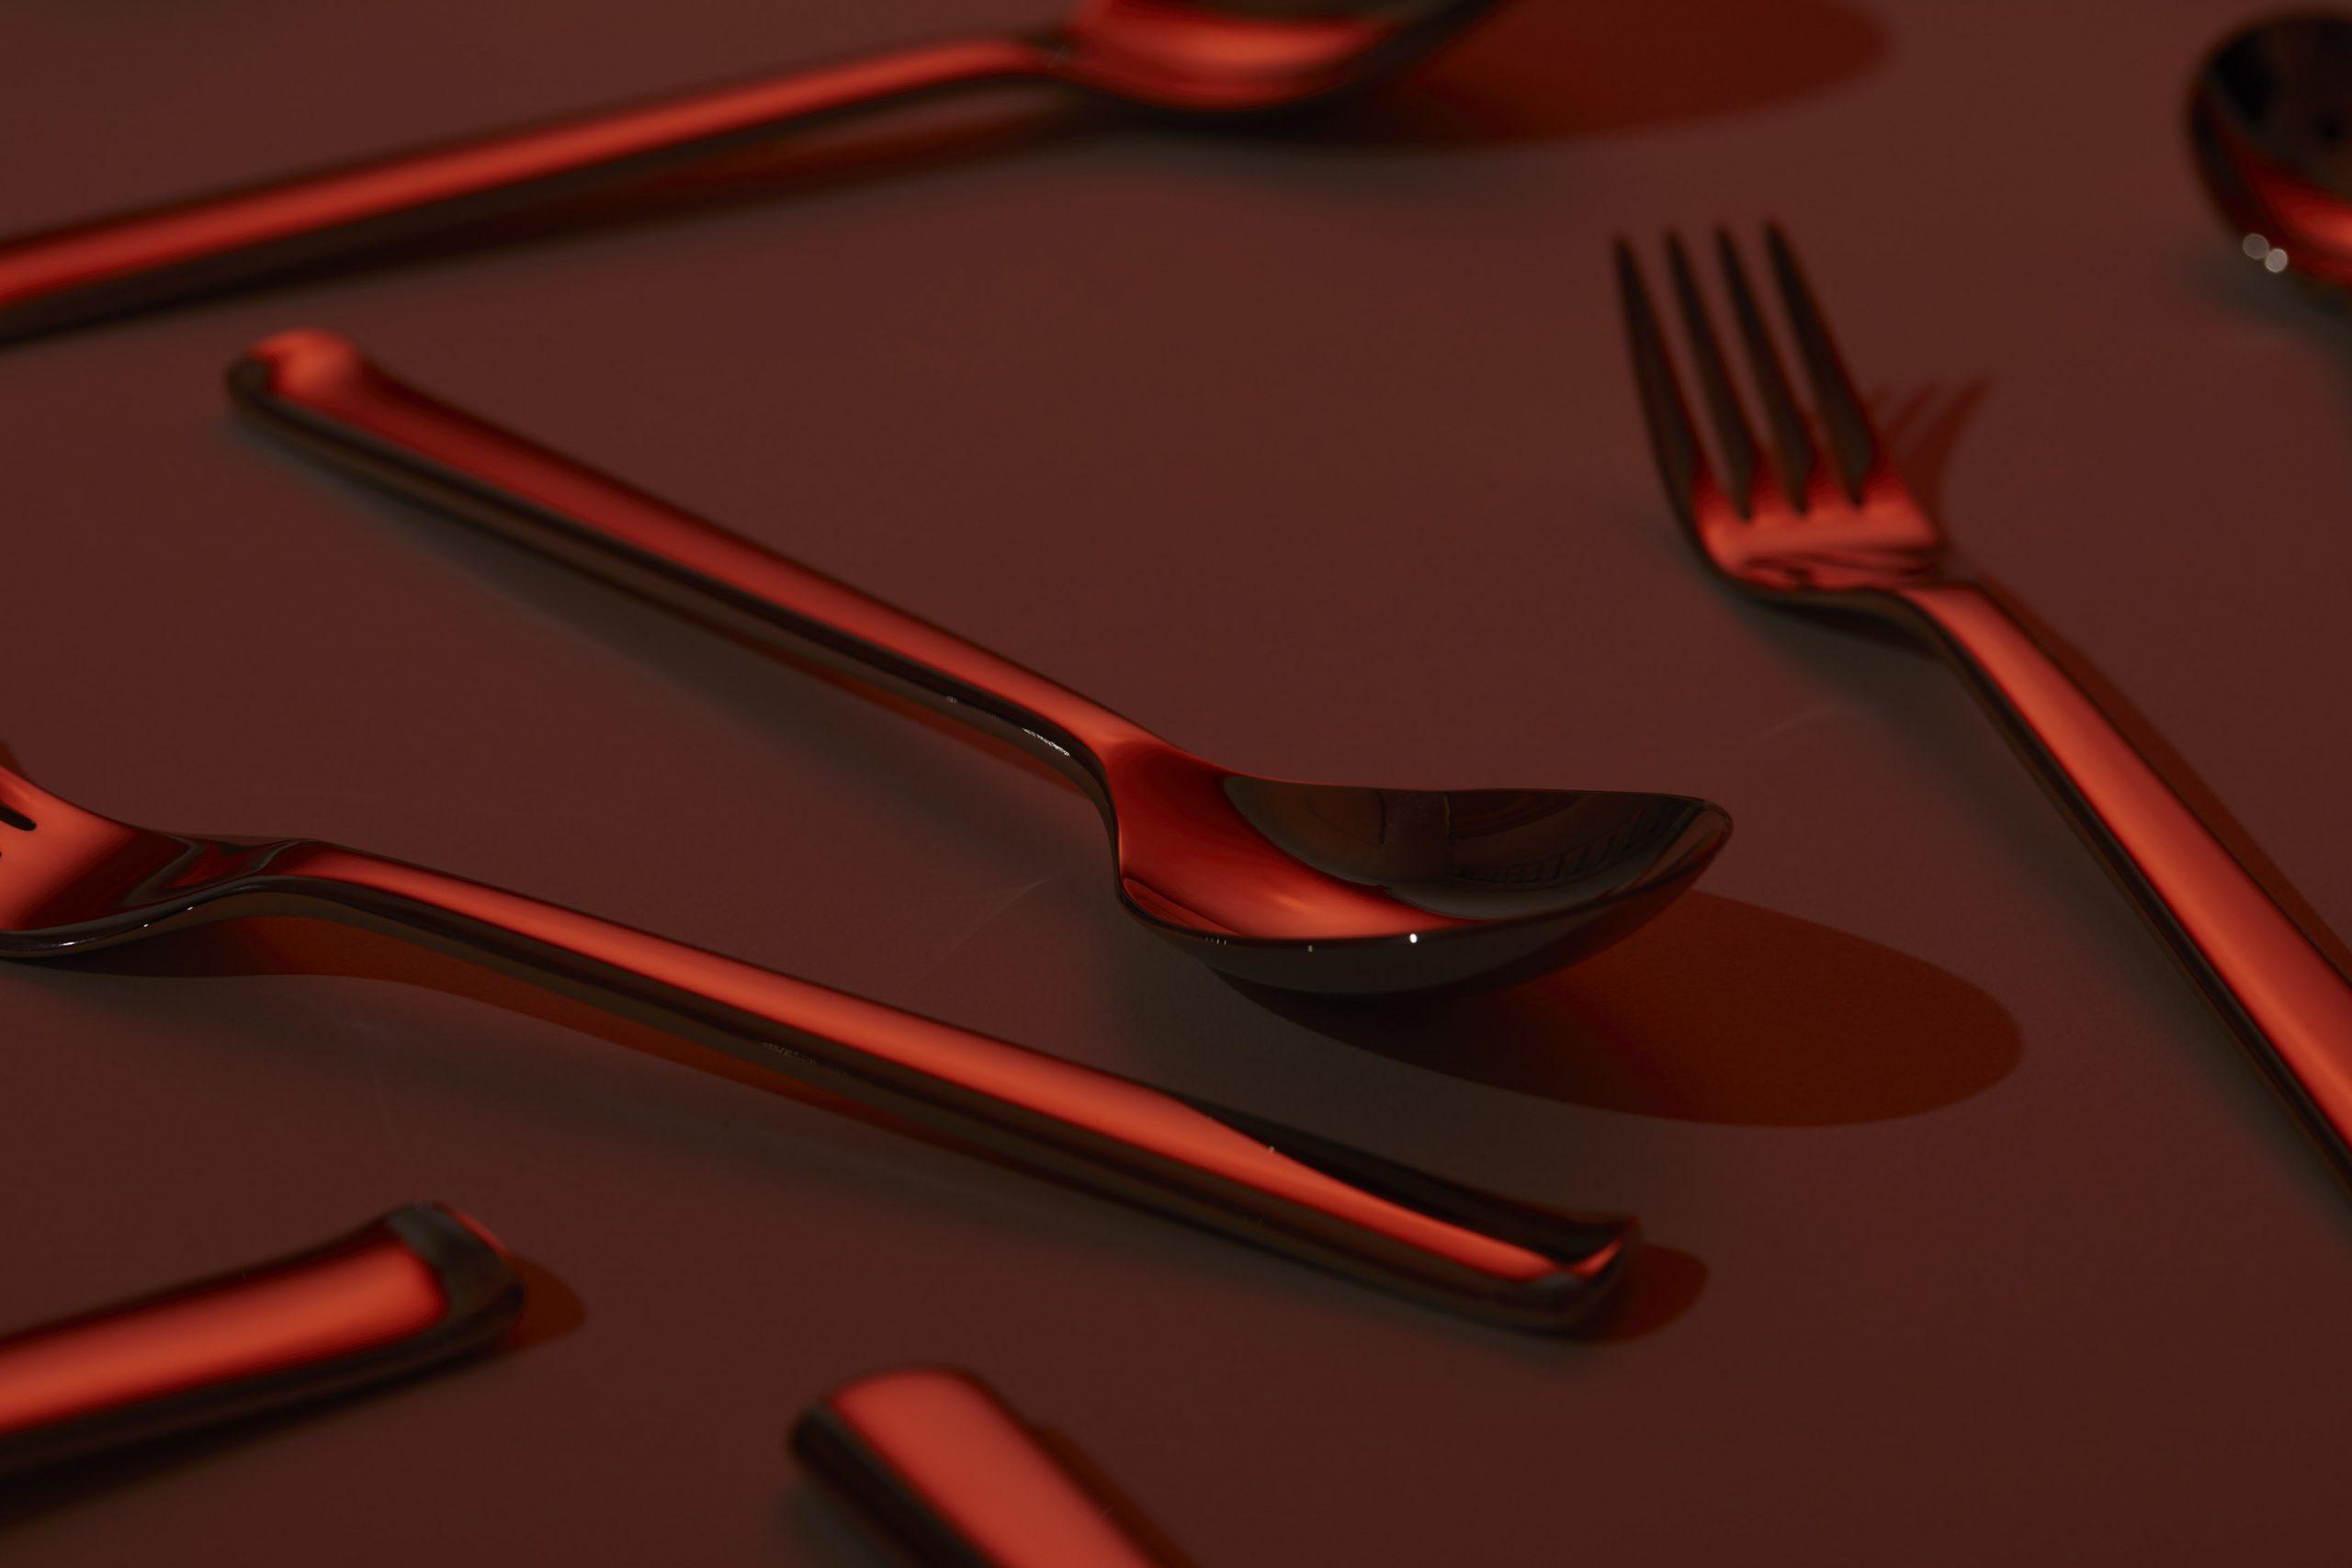 still life photograph of cutlery